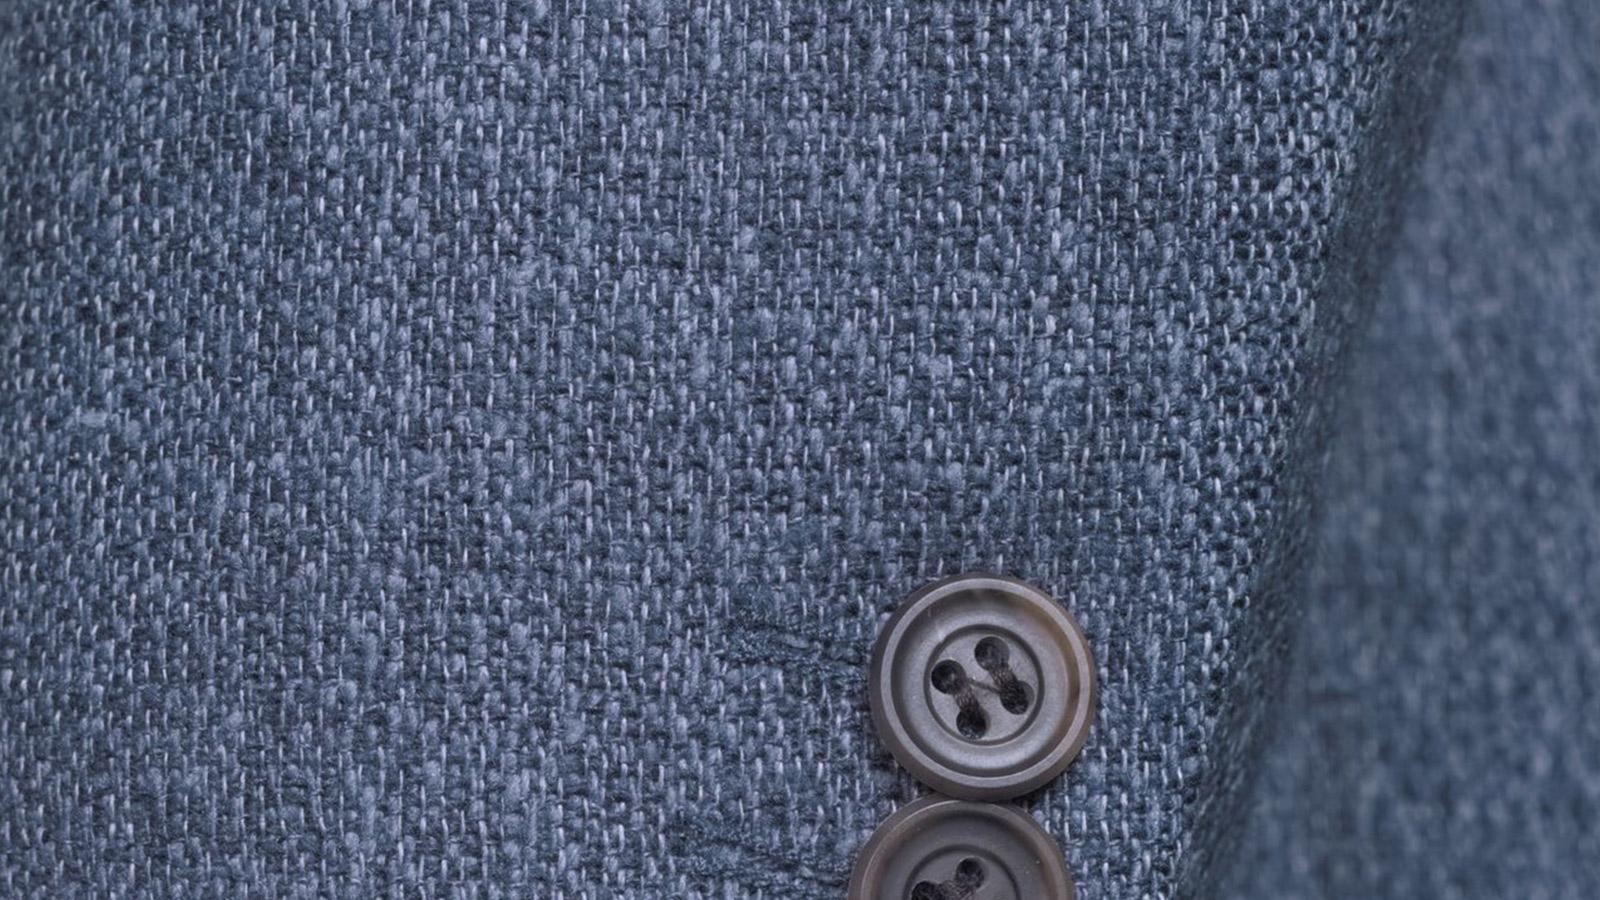 Navy Blue Melange Wool Silk & Linen Blazer - slider image 1